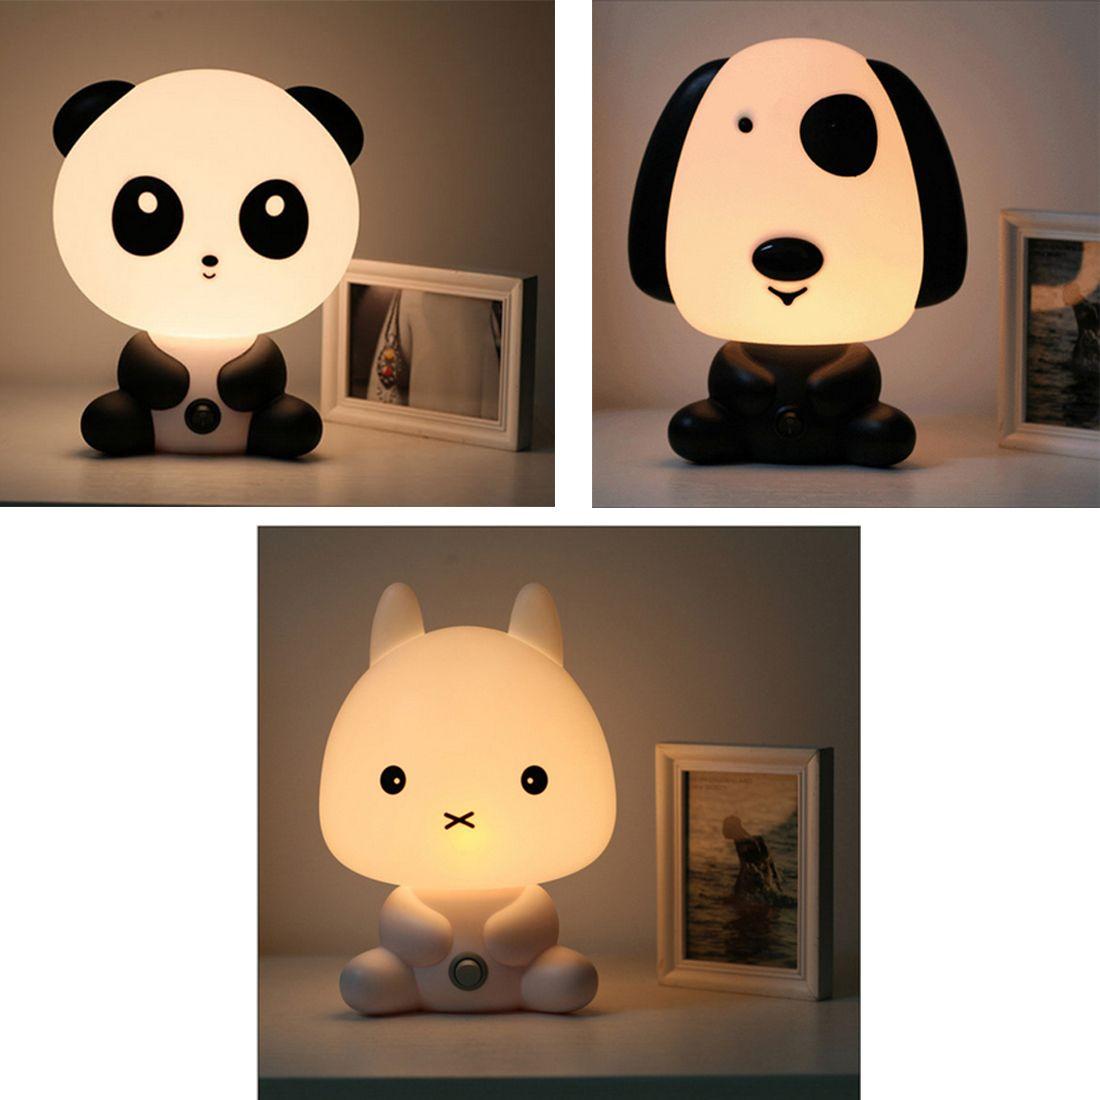 Hot EU Plug Baby Bedroom Lamps Night Light Cartoon Pets Rabbit Panda PVC Plastic Sleep Led Kid Lamp Bulb Nightlight for Children